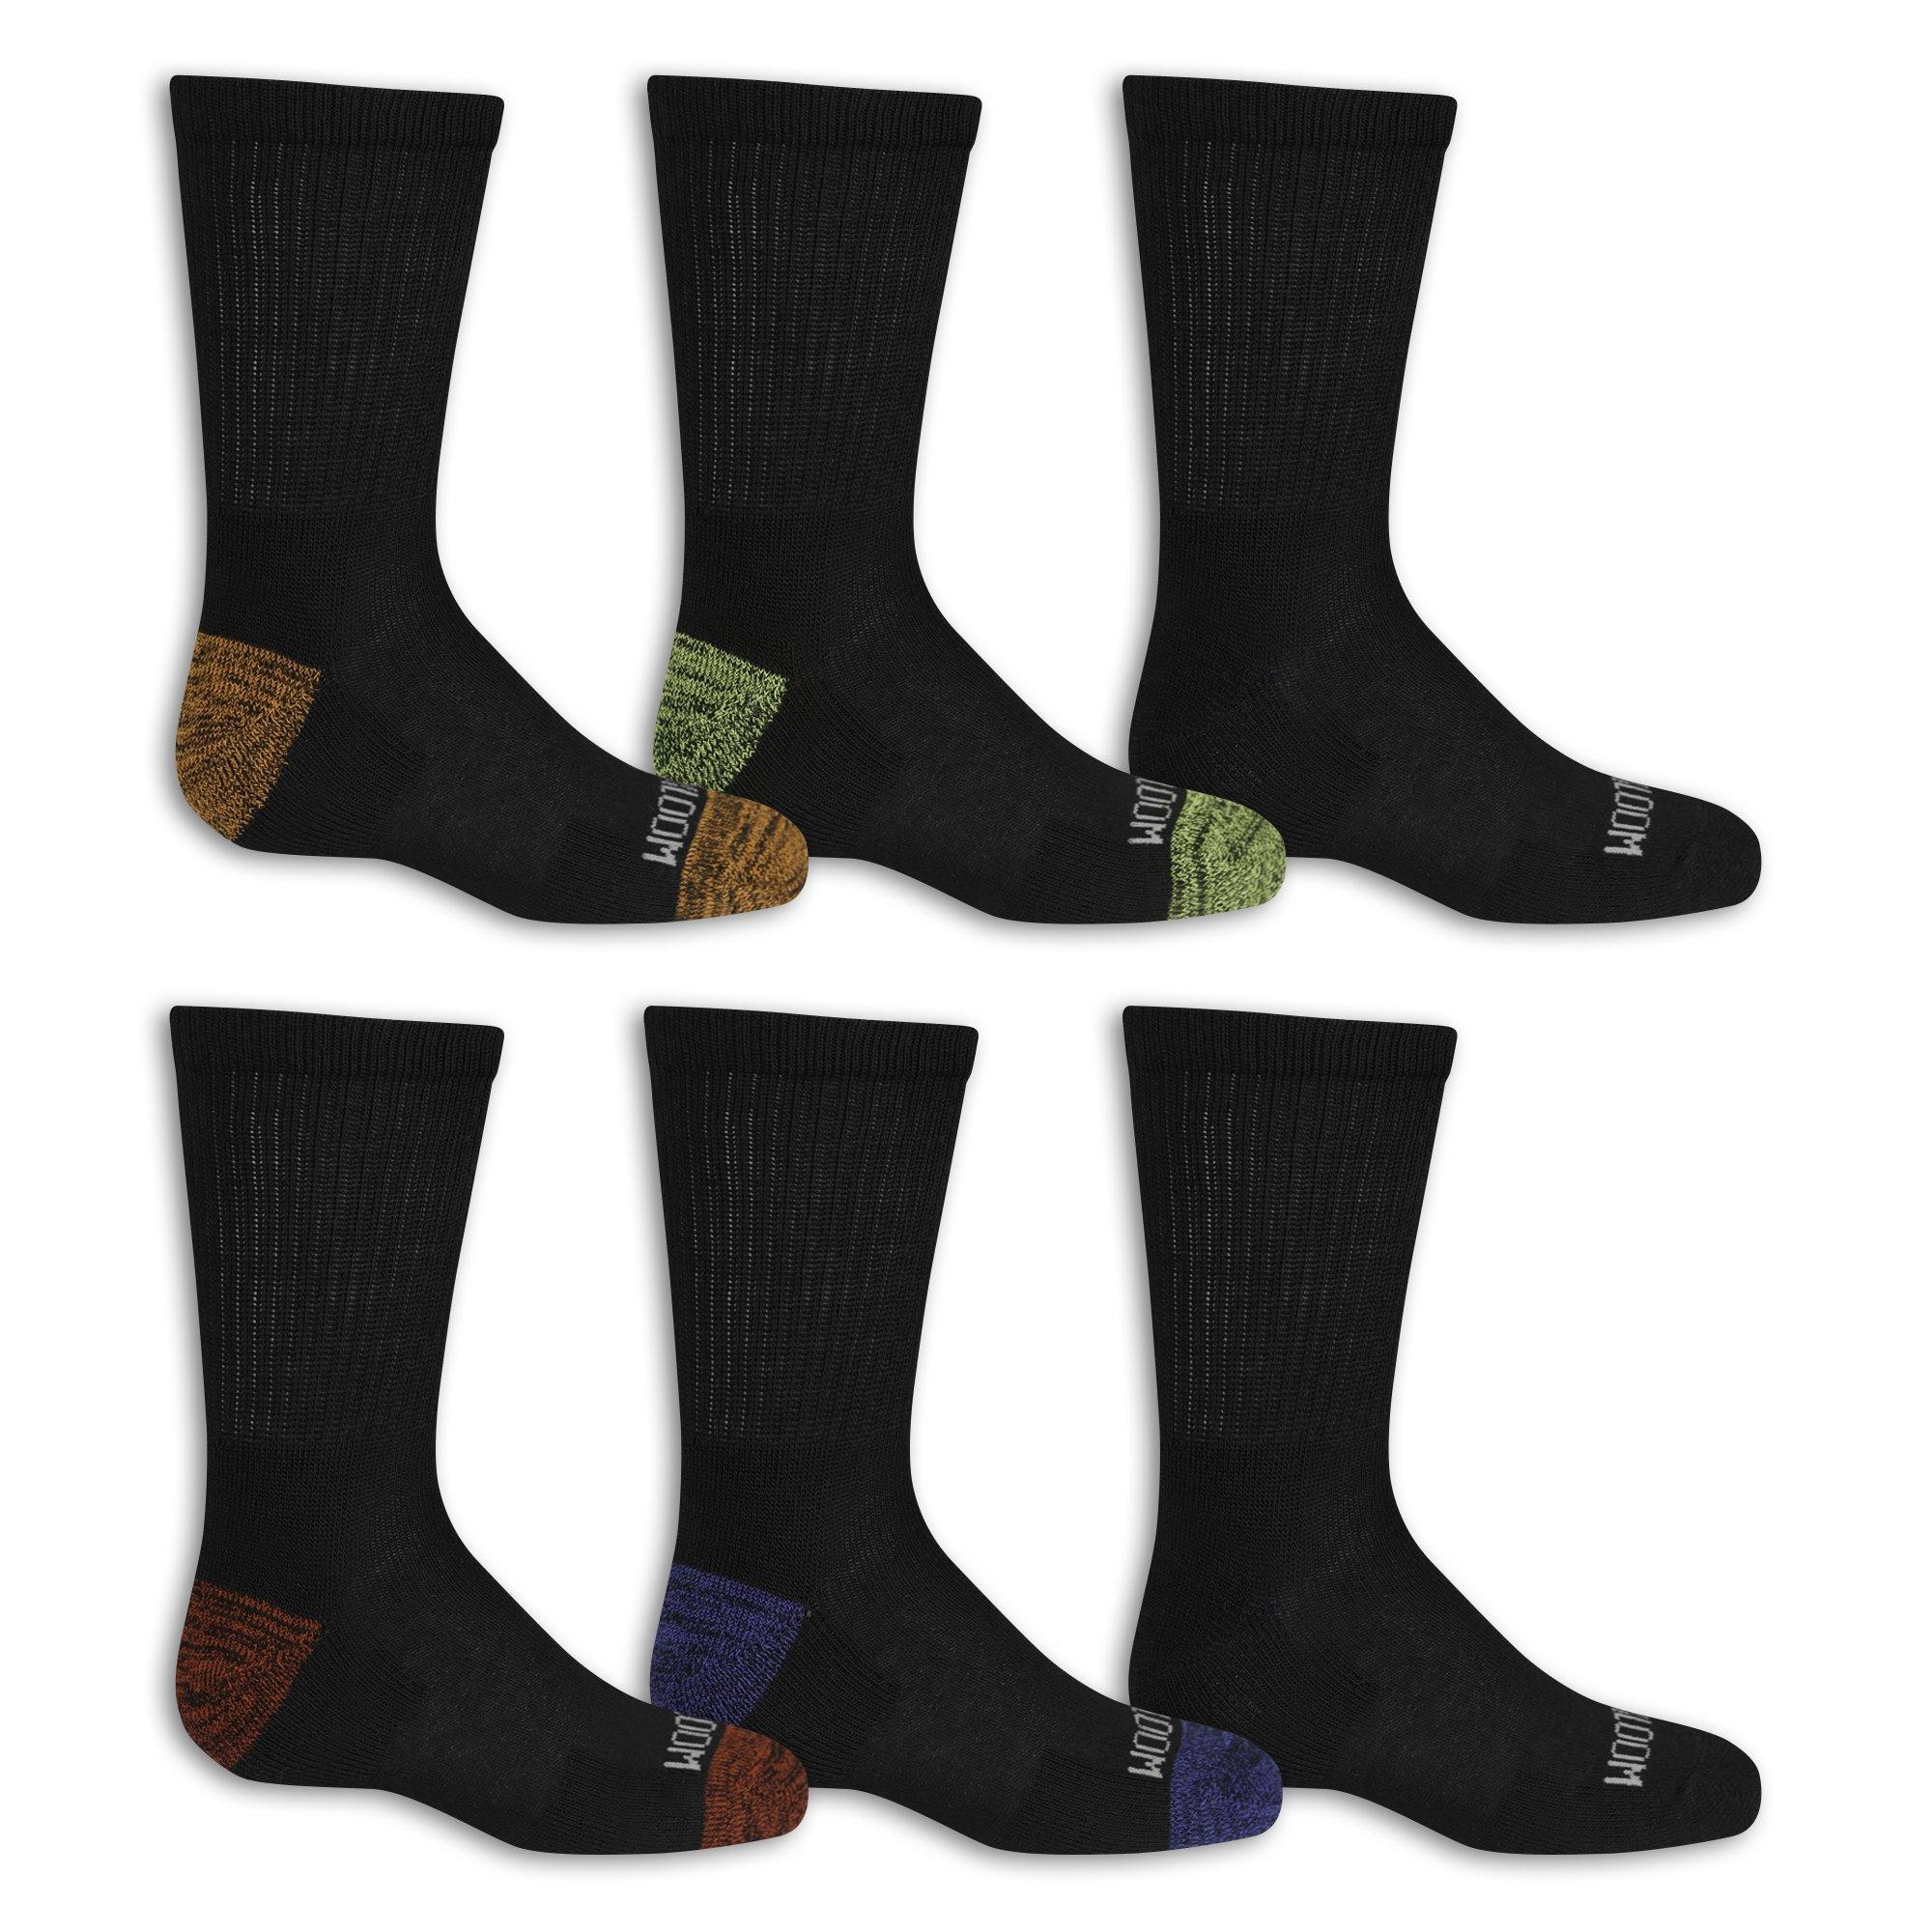 Fruit Of The Loom Big Boys' 10 Pack Crew Socks, Black/Gray/Blue/Green/Orange/Red, Shoe Size: 3-9